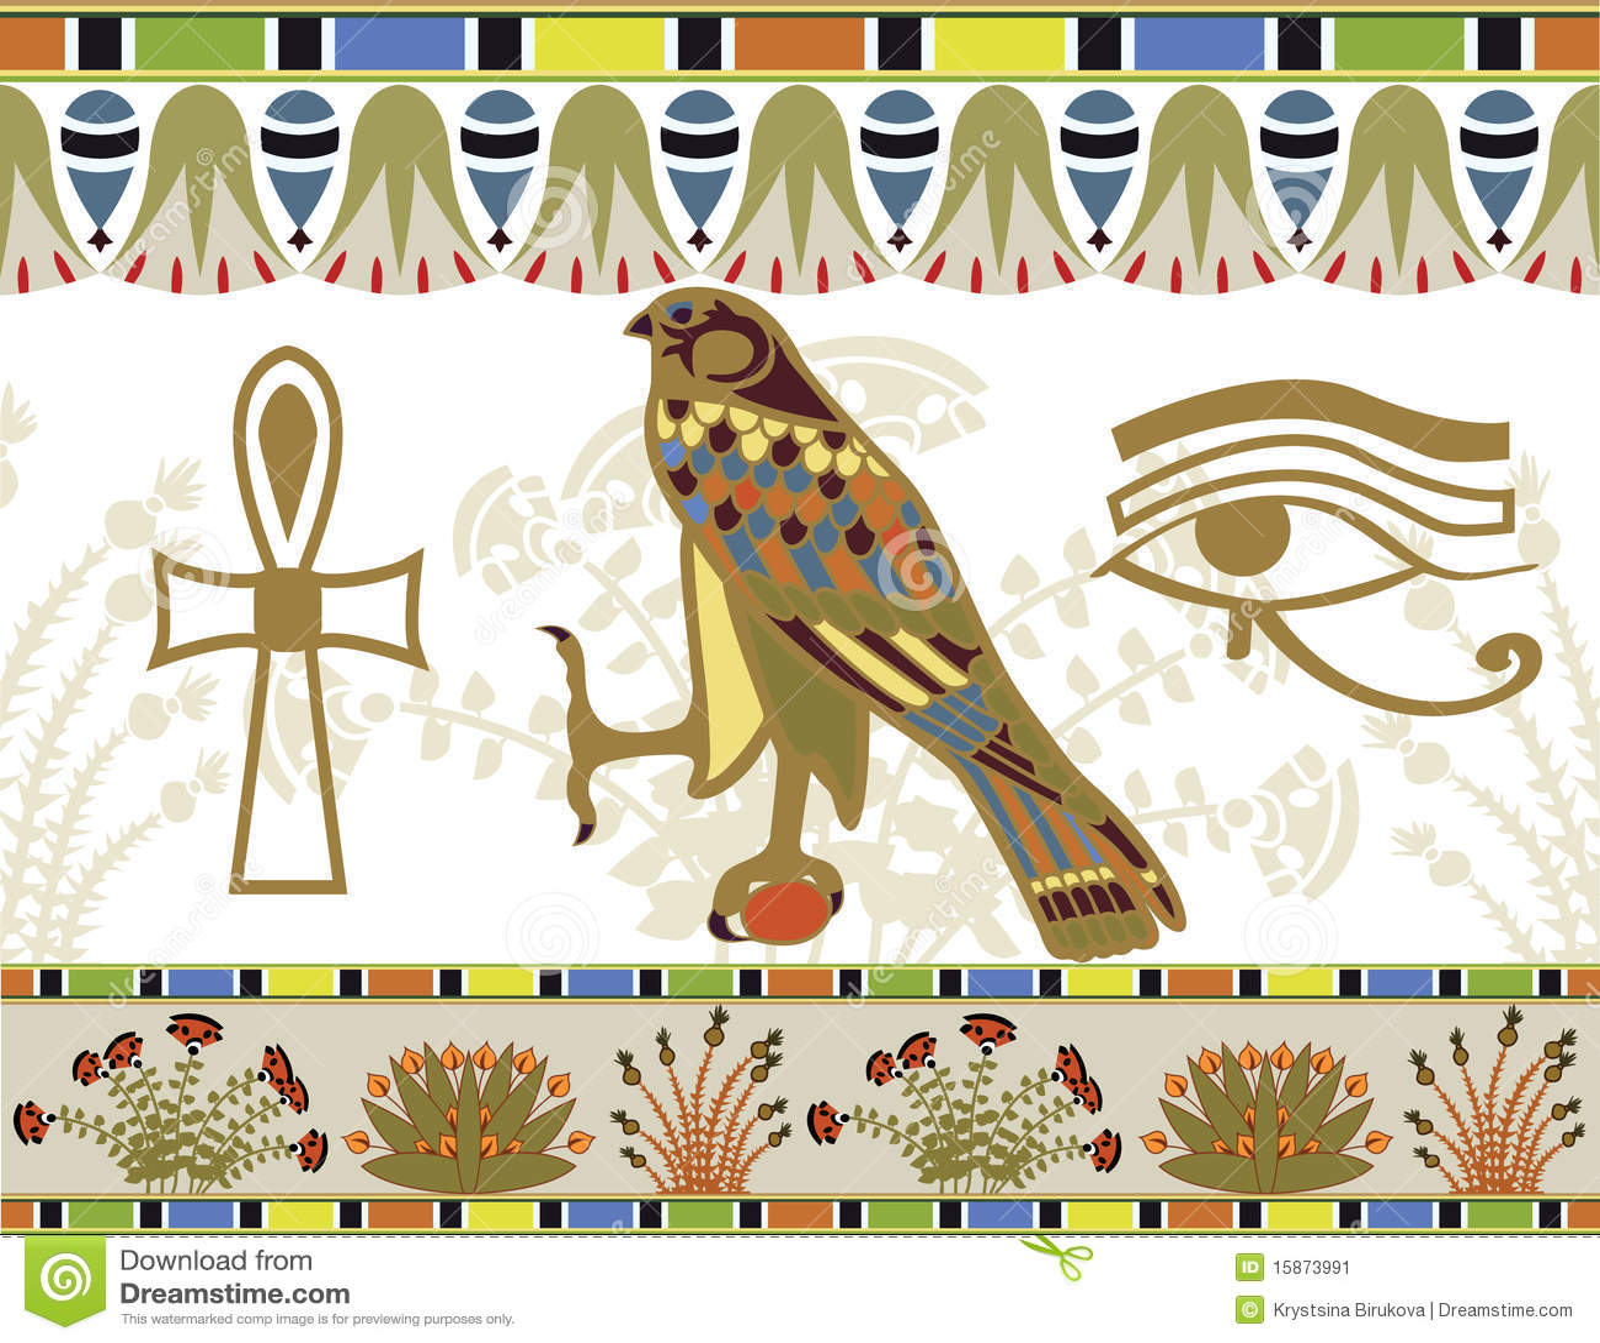 Egyptian Patterns And Symbols Stock Image - Image: 15873991